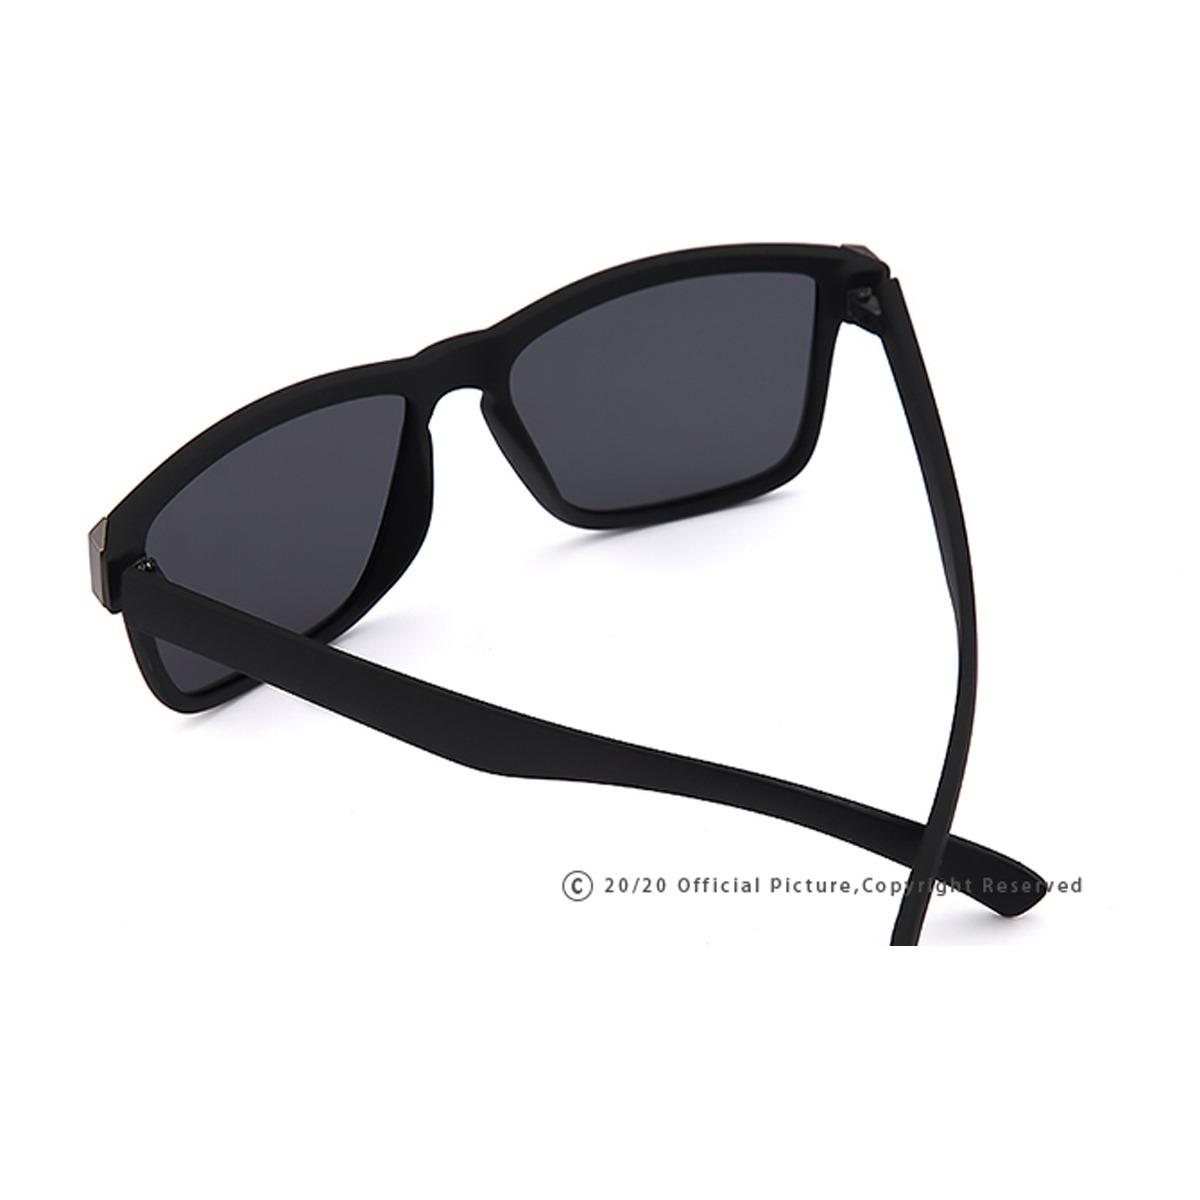 8b056d4dd oculos de sol masculino original feminino 20/20 premium. Carregando zoom.